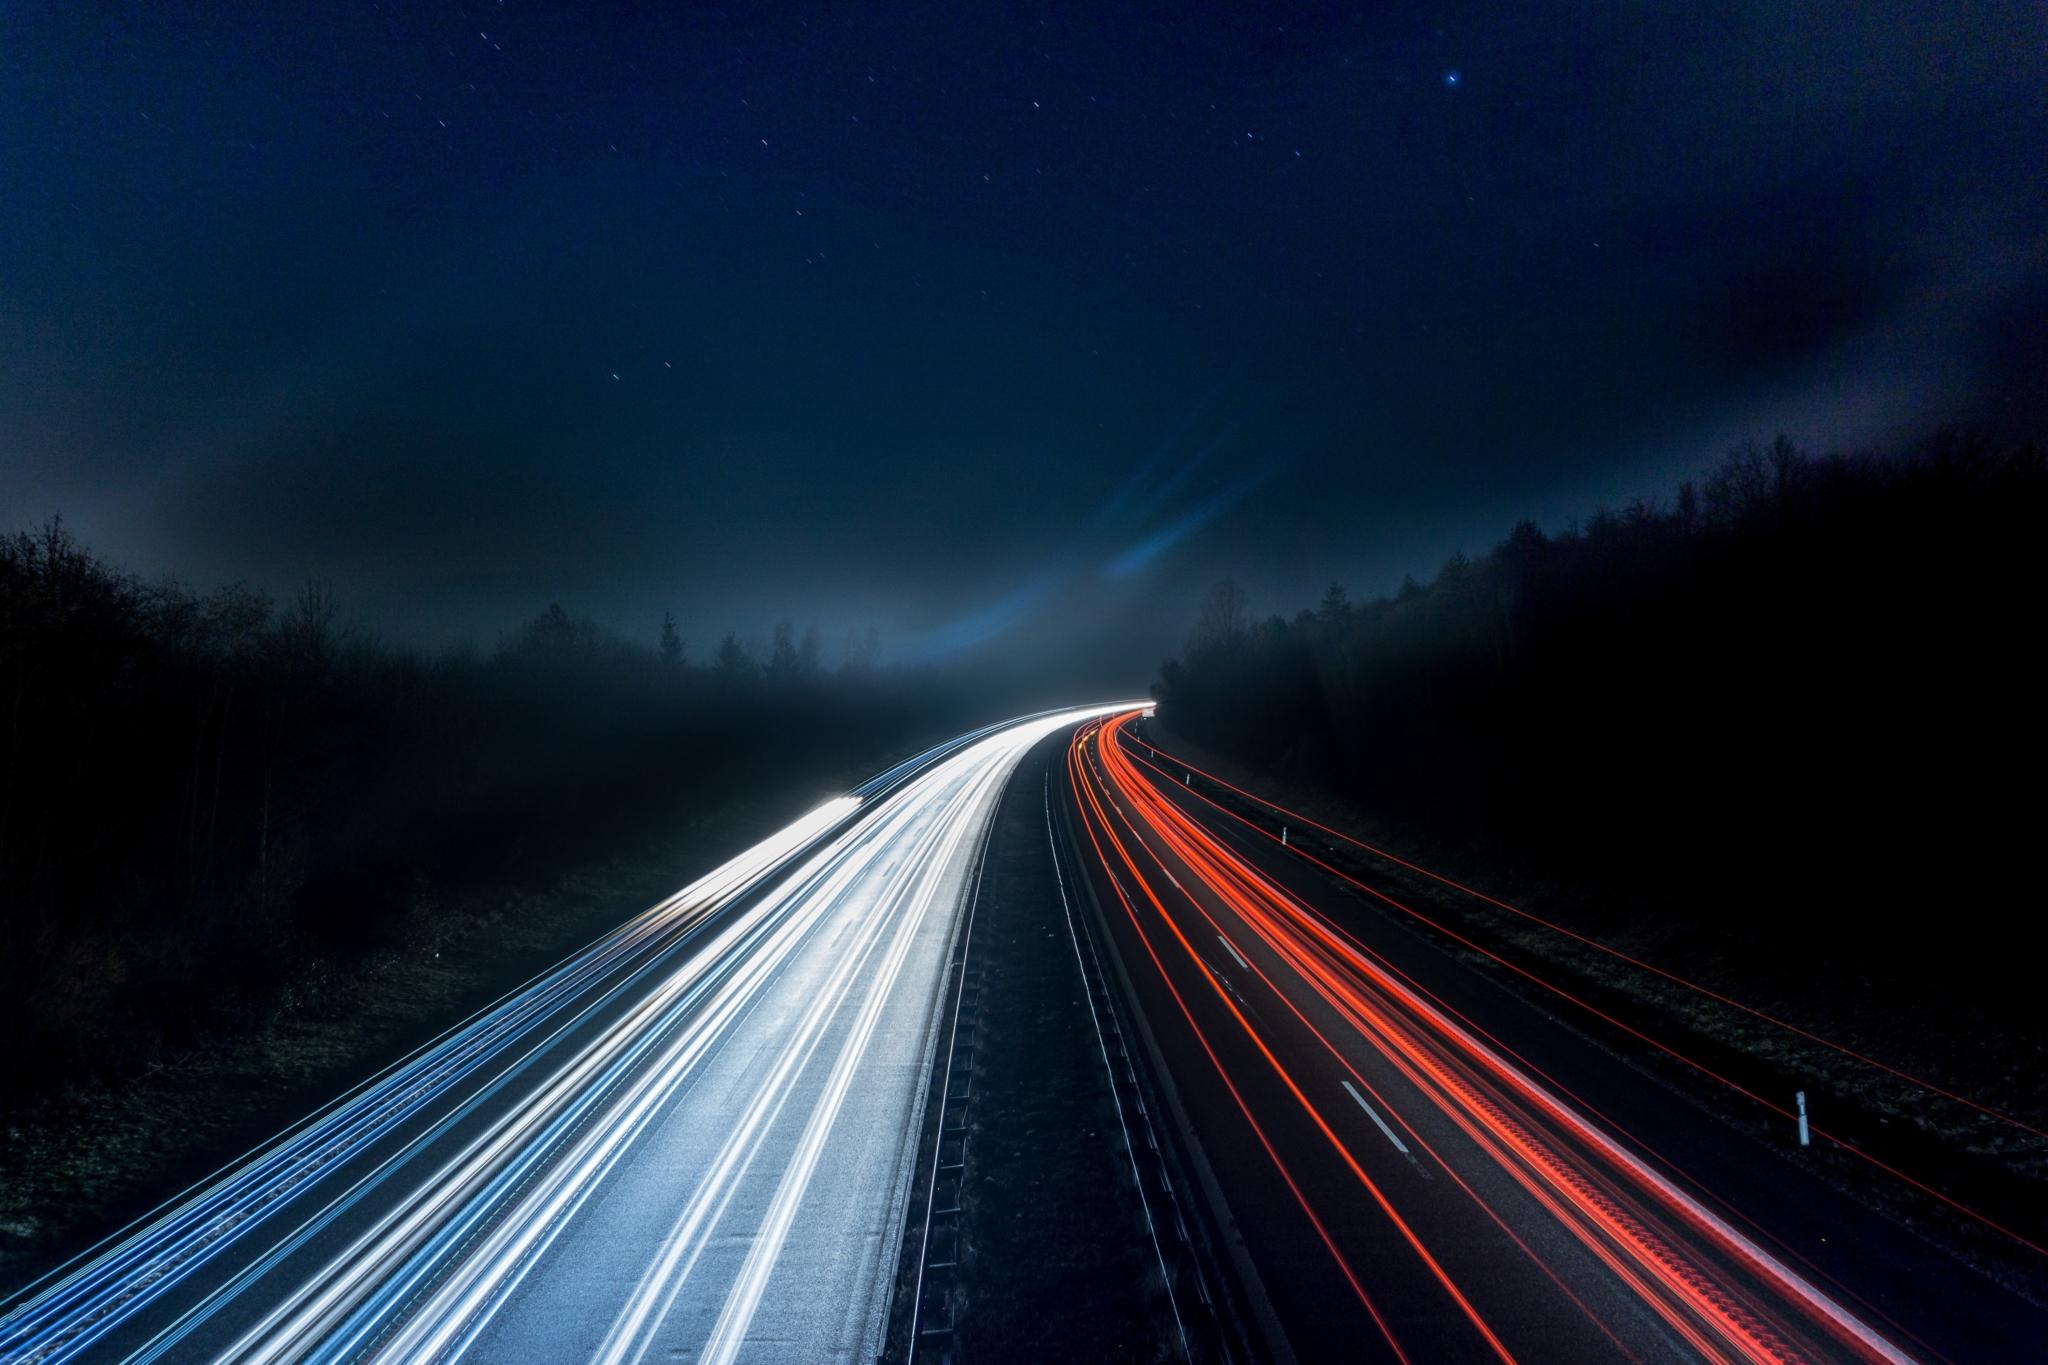 ETRMA calls for EC to publish legislative proposal on in-vehicle data access